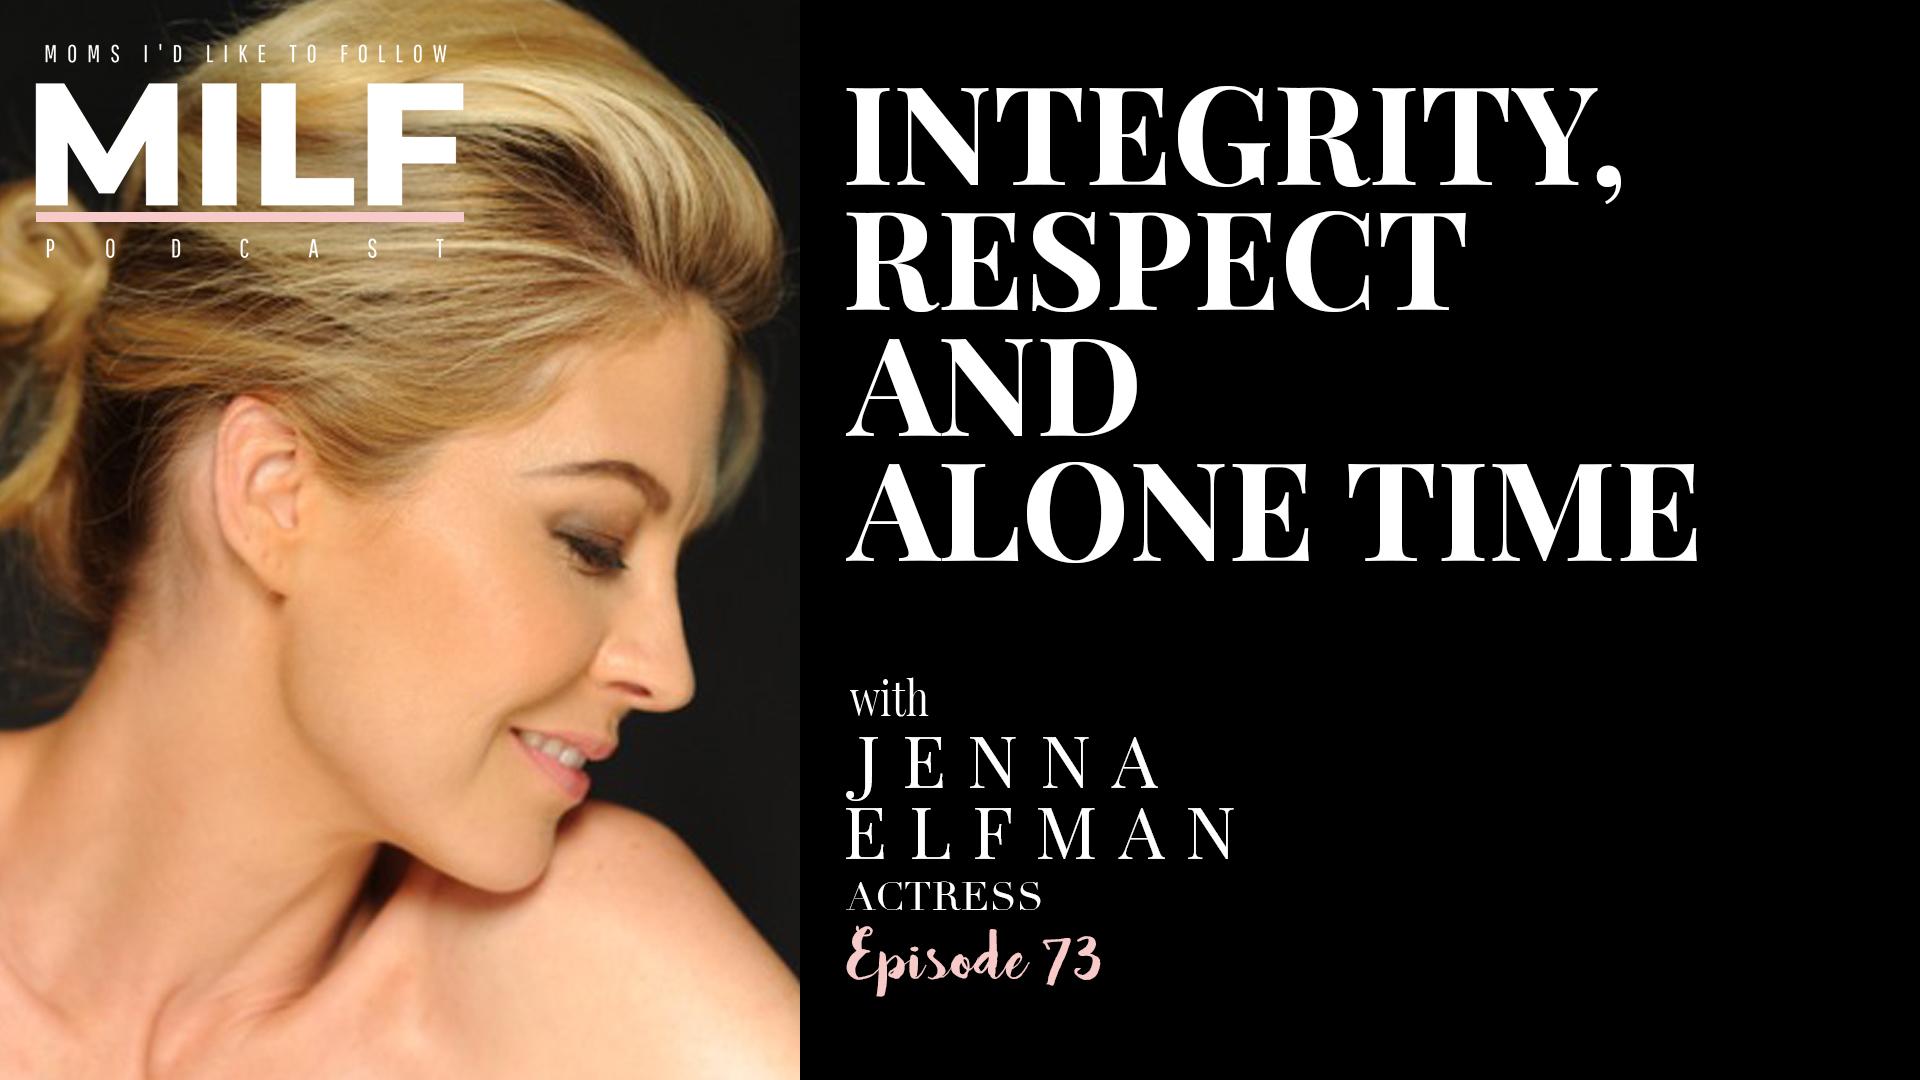 jenna elfman sex and the city